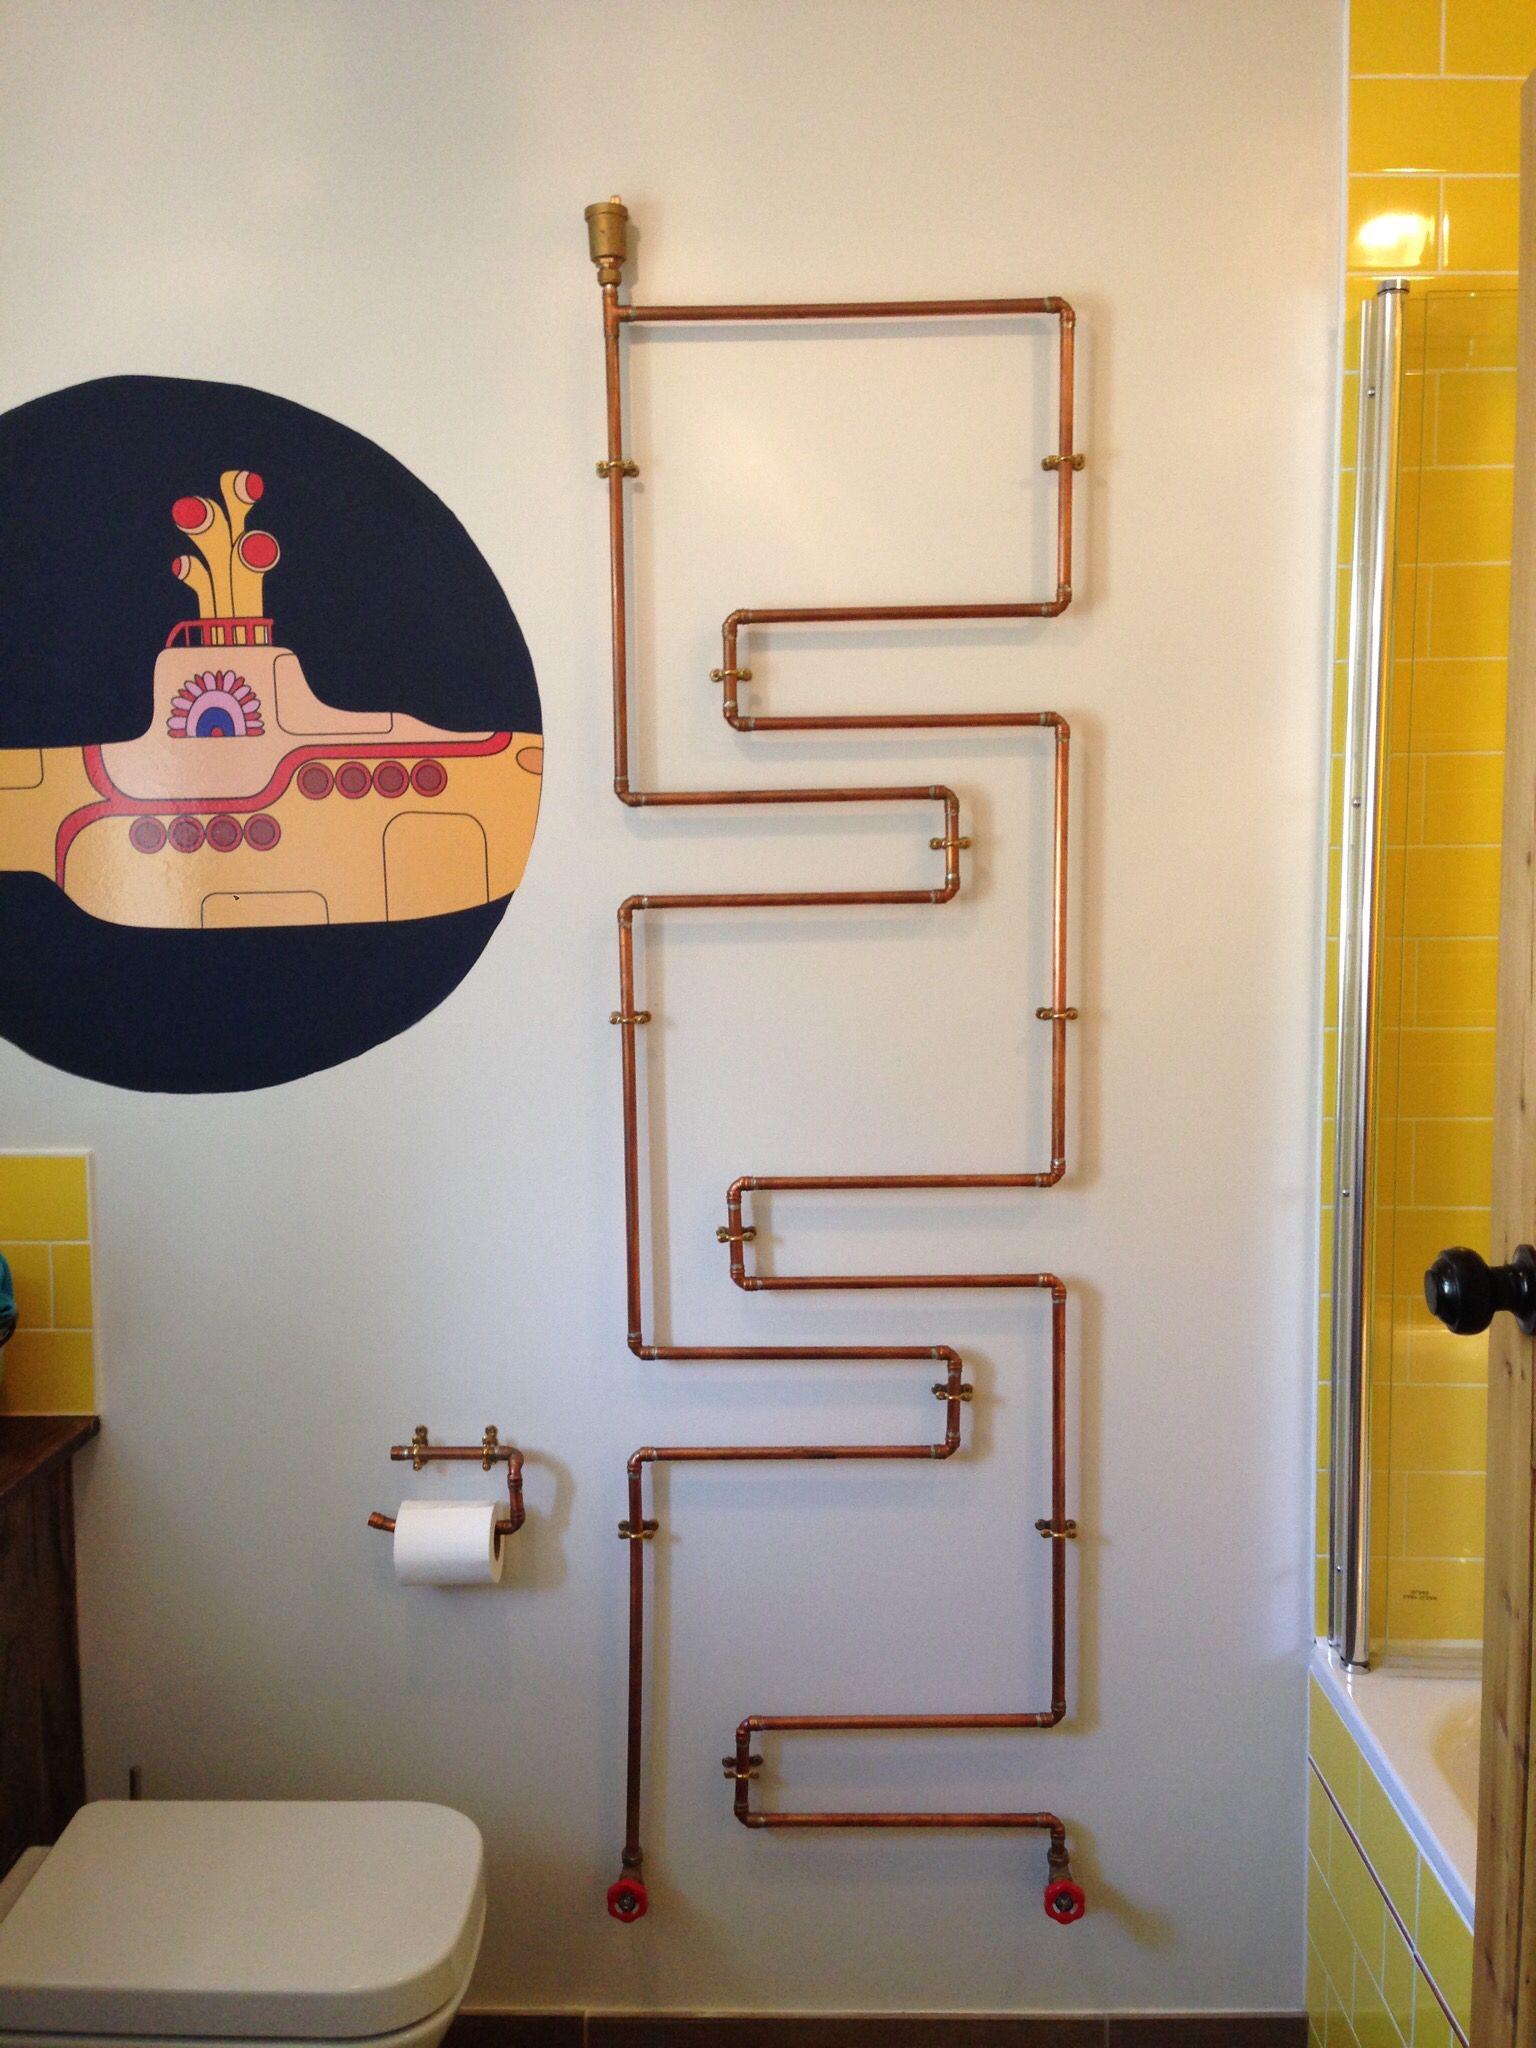 yellow submarine themed bathroom. copper pipe radiator